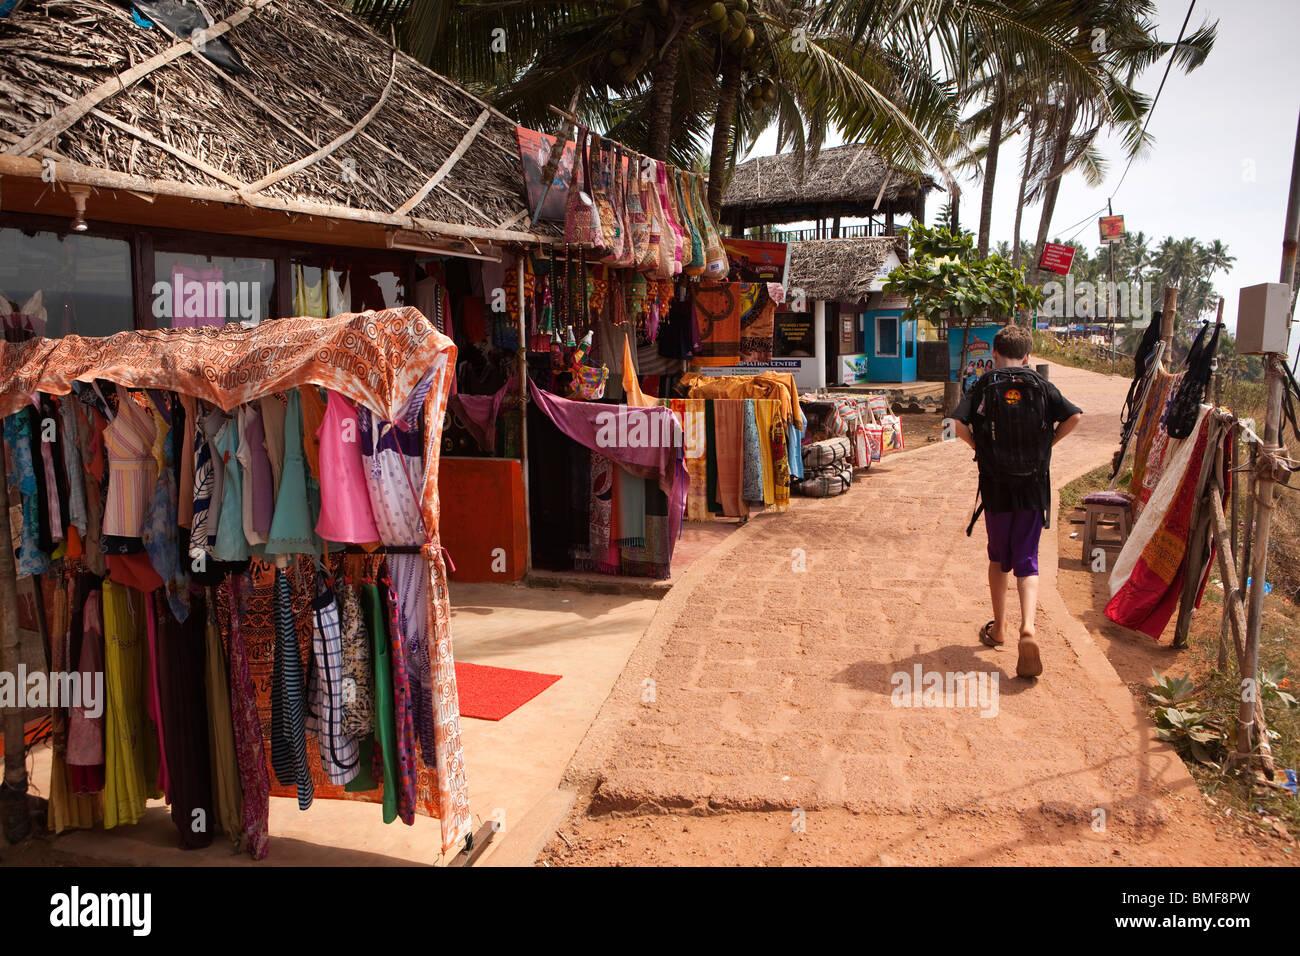 India, Kerala, Varkala clifftop clothes and souvenir shop Stock Photo